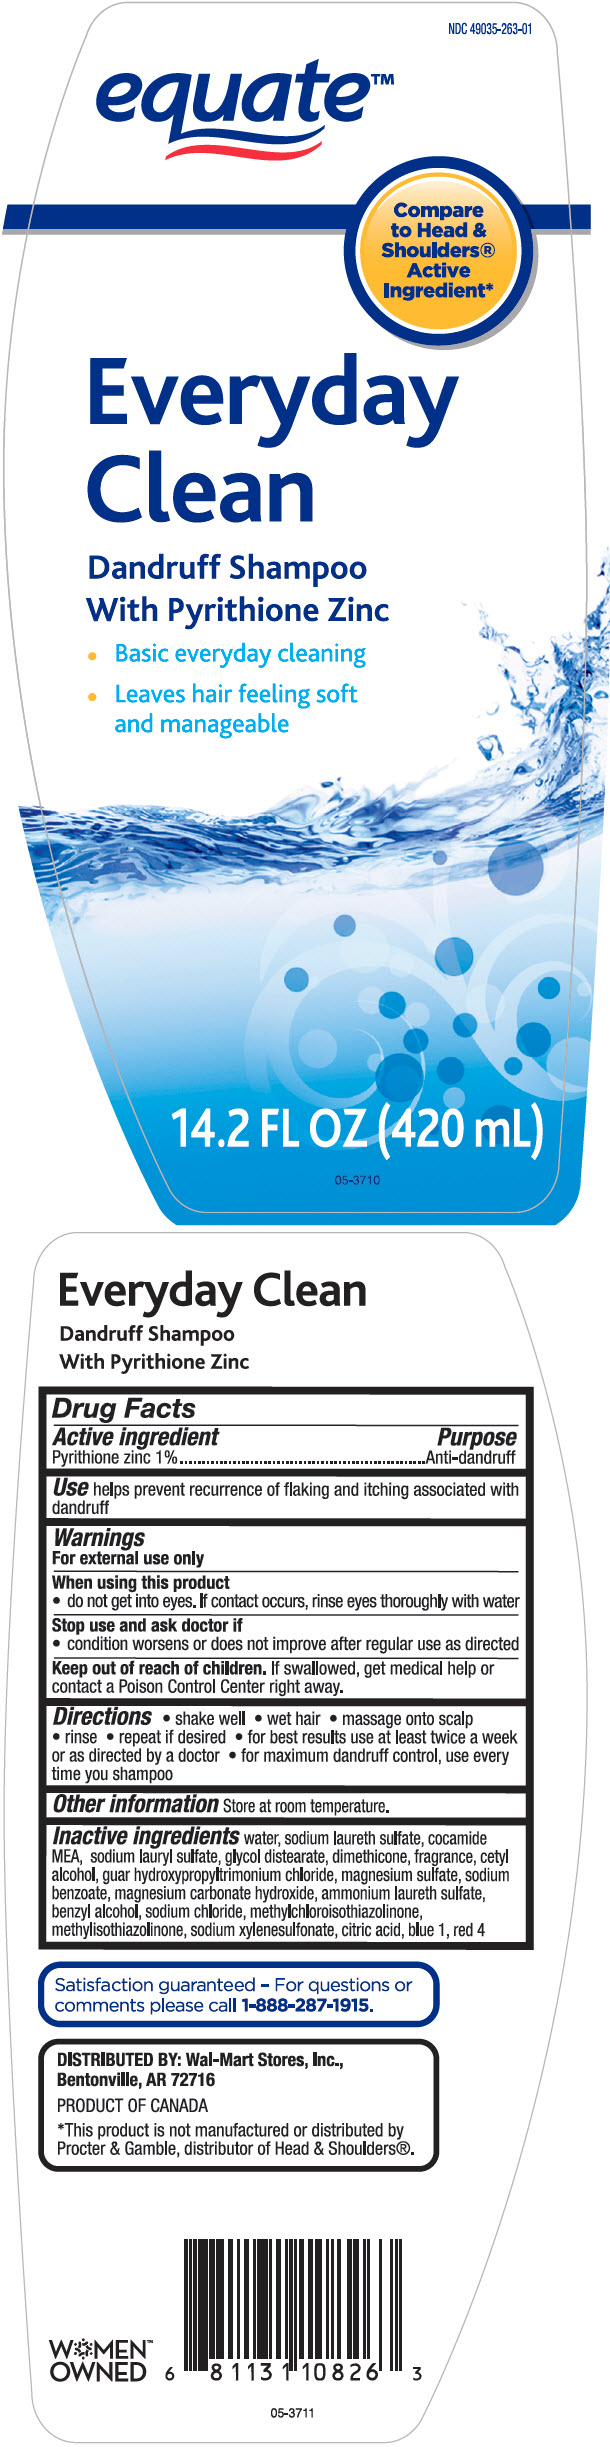 Equate Everyday Clean Dandruff Anti-dandruff | Pyrithione Zinc 10 Mg In 1 Ml while Breastfeeding